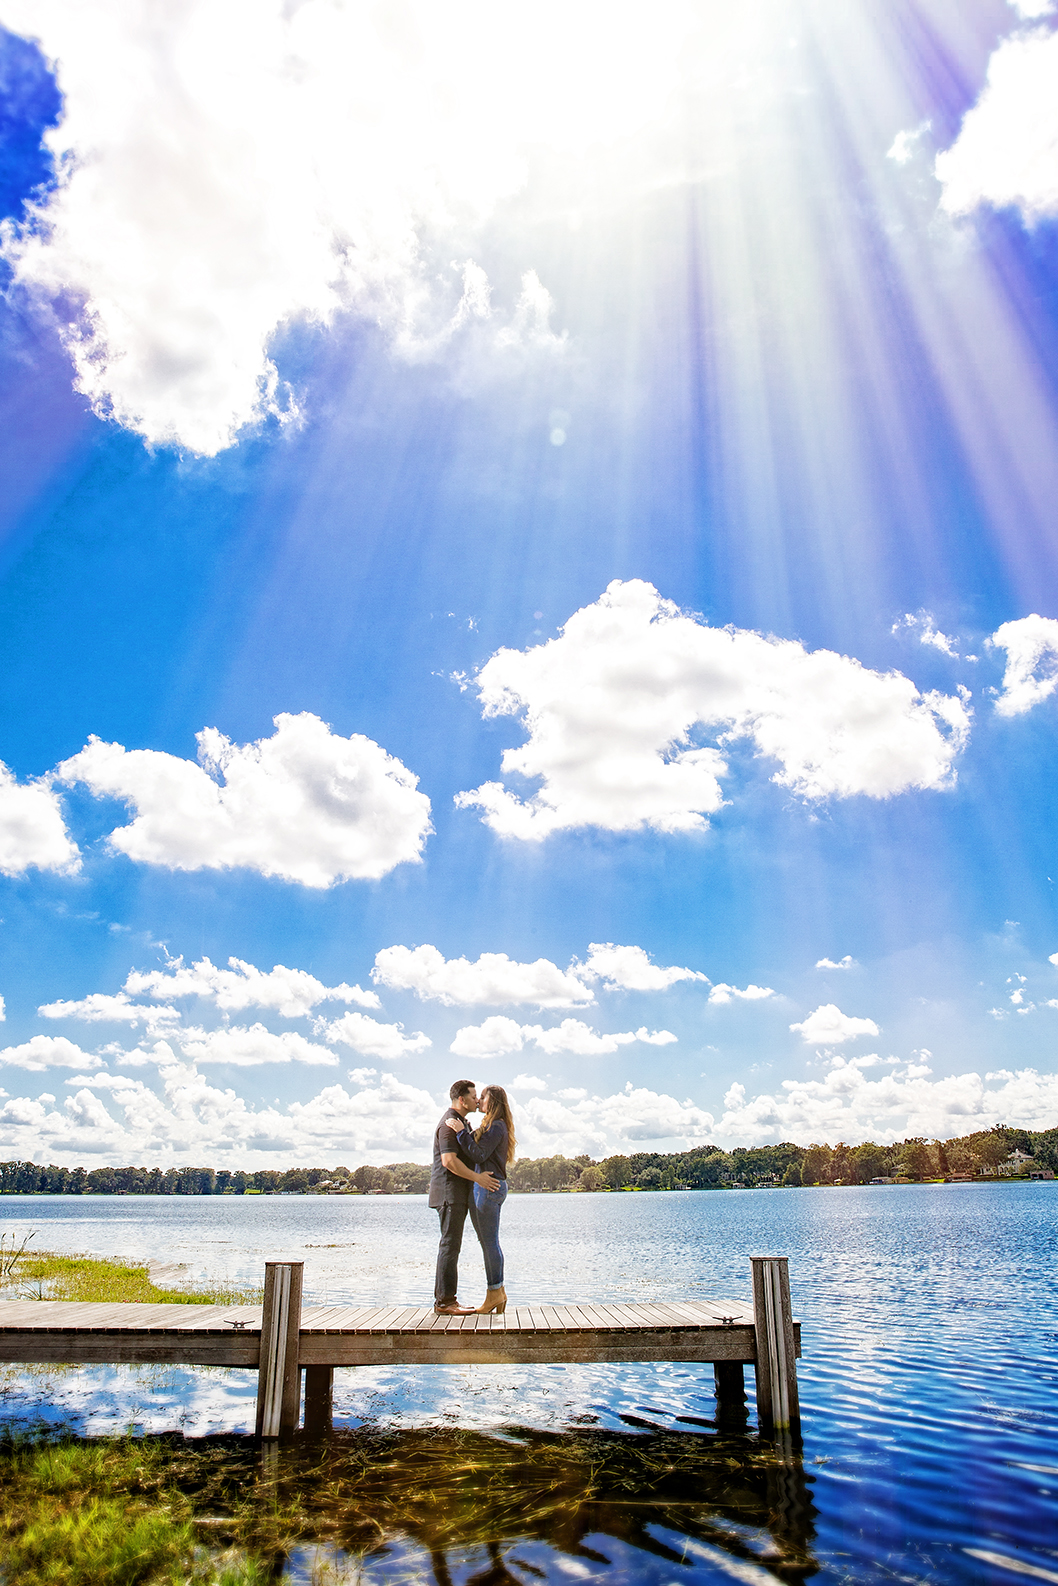 DBatista Photography_Engagement Session_Wedding Photographer In Orlando Florida_Engagement Orlando_P